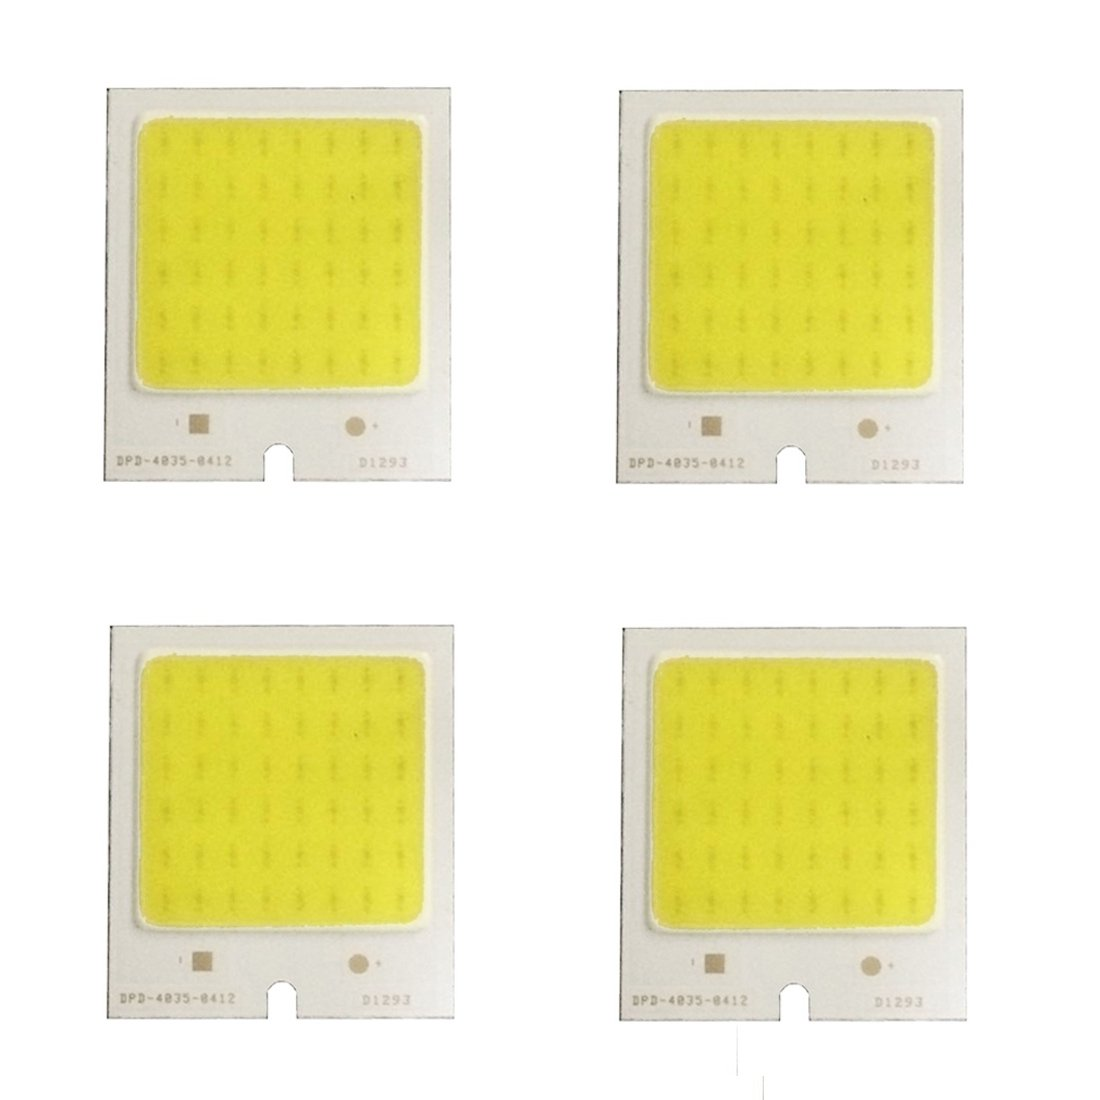 Lights Bulbs, 4 PCS YouOKLight 4W 480mA 6000K 48-LED COB Chip Beads Board Lamp, DC 12V ( Color : White Light )